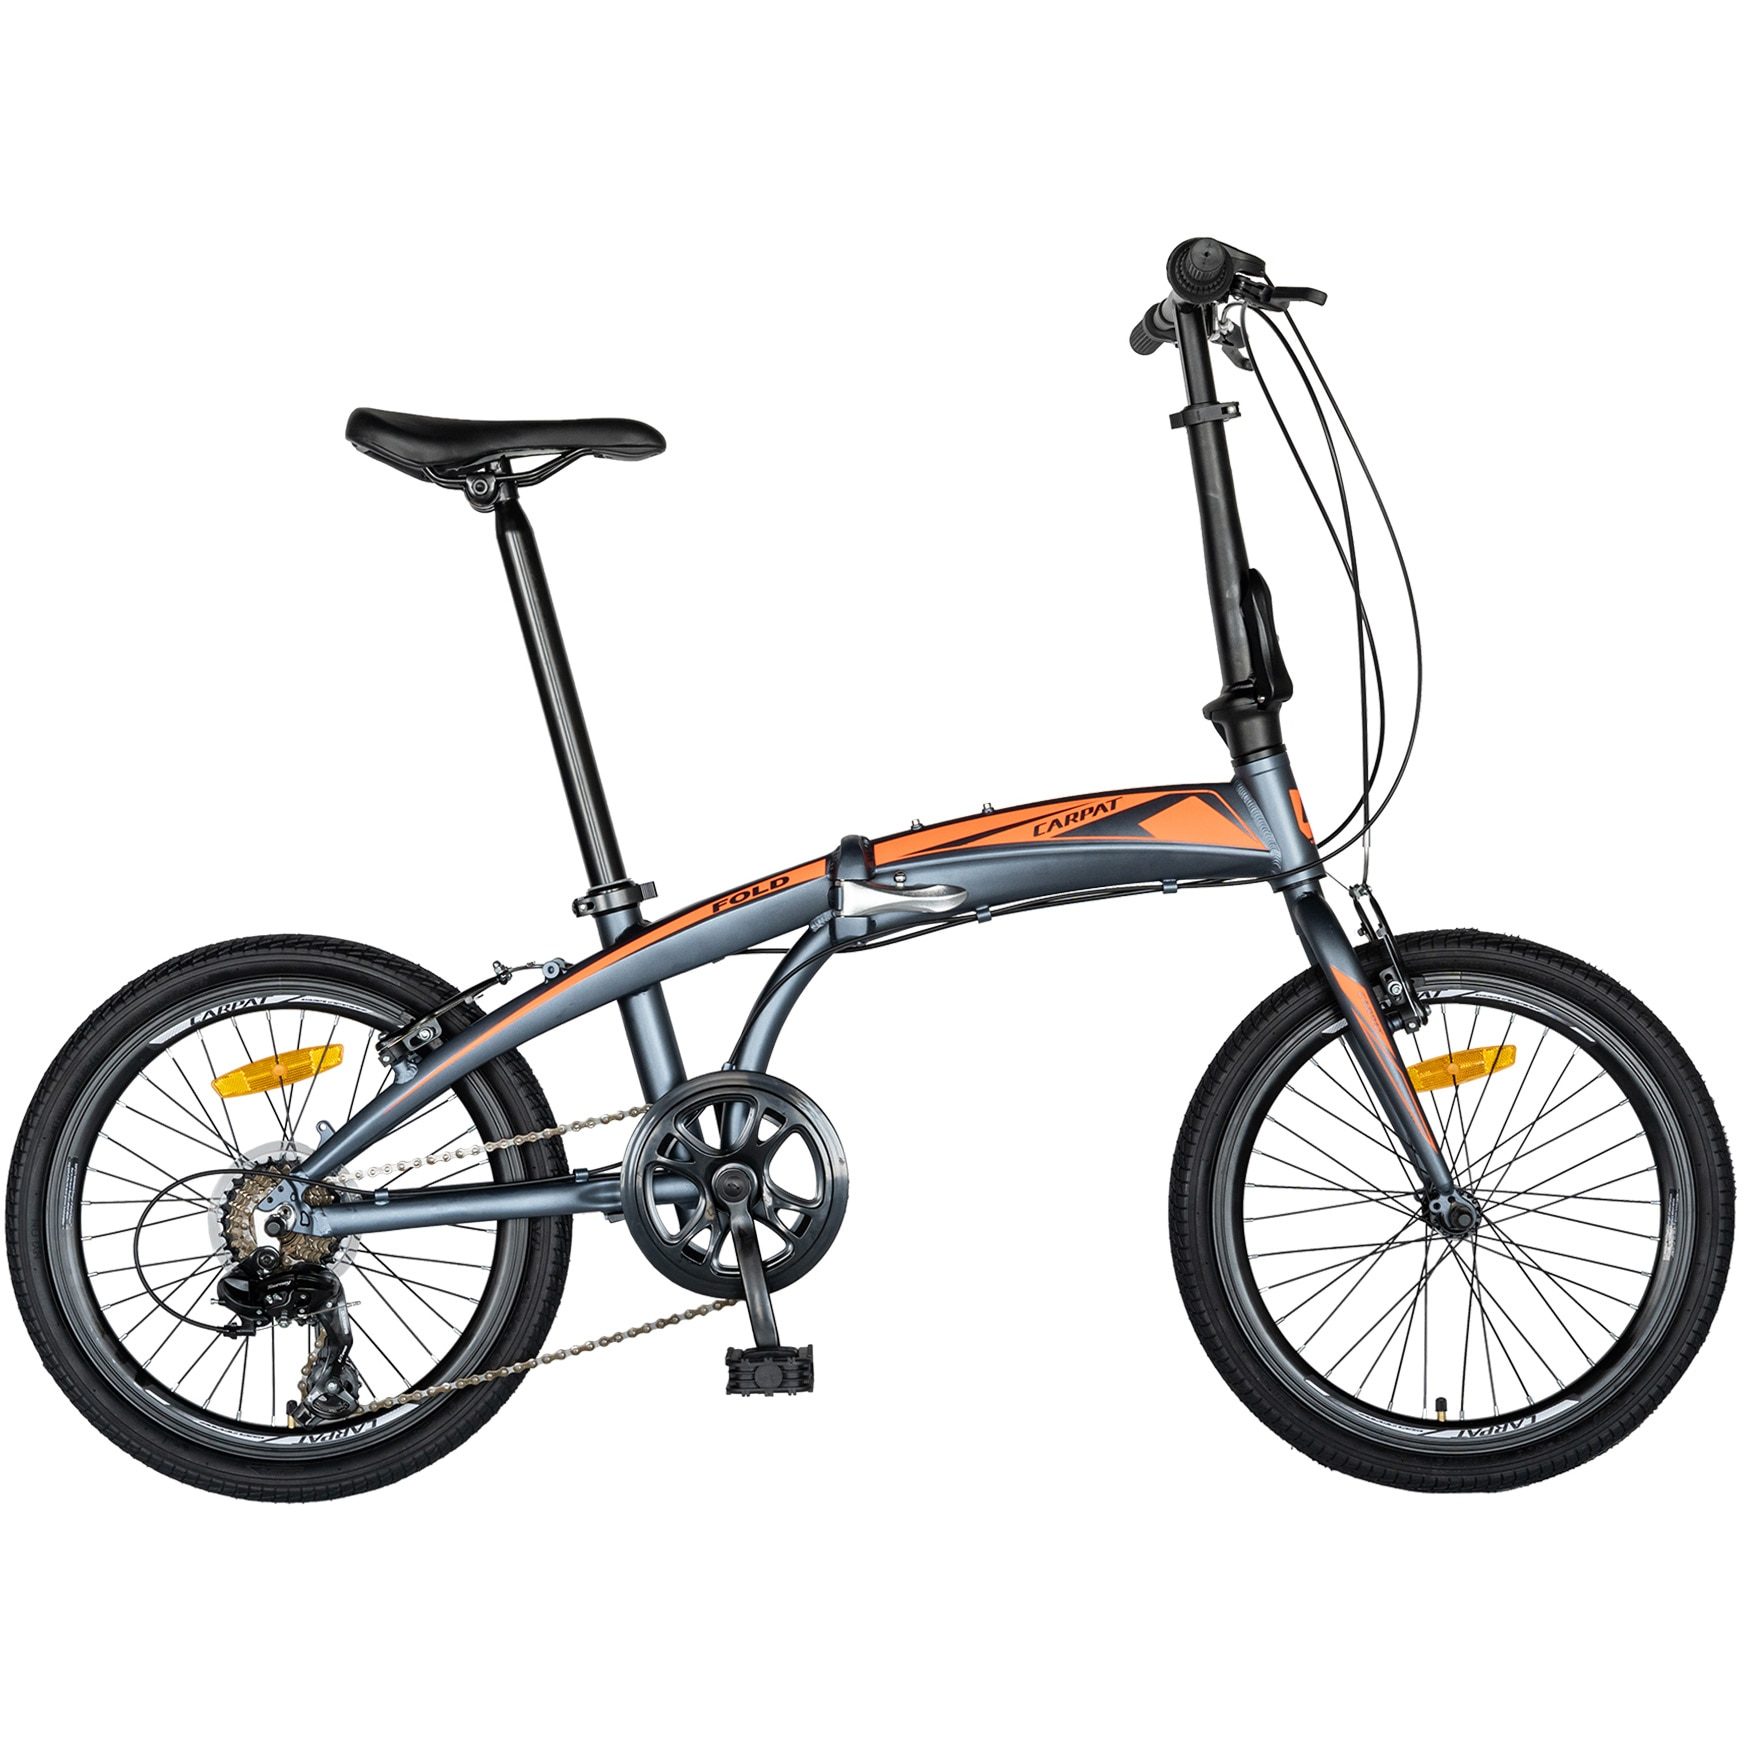 Fotografie Bicicleta pliabila, C2052C, cadru aluminiu, transmisie Shimano, Gri/Portocaliu